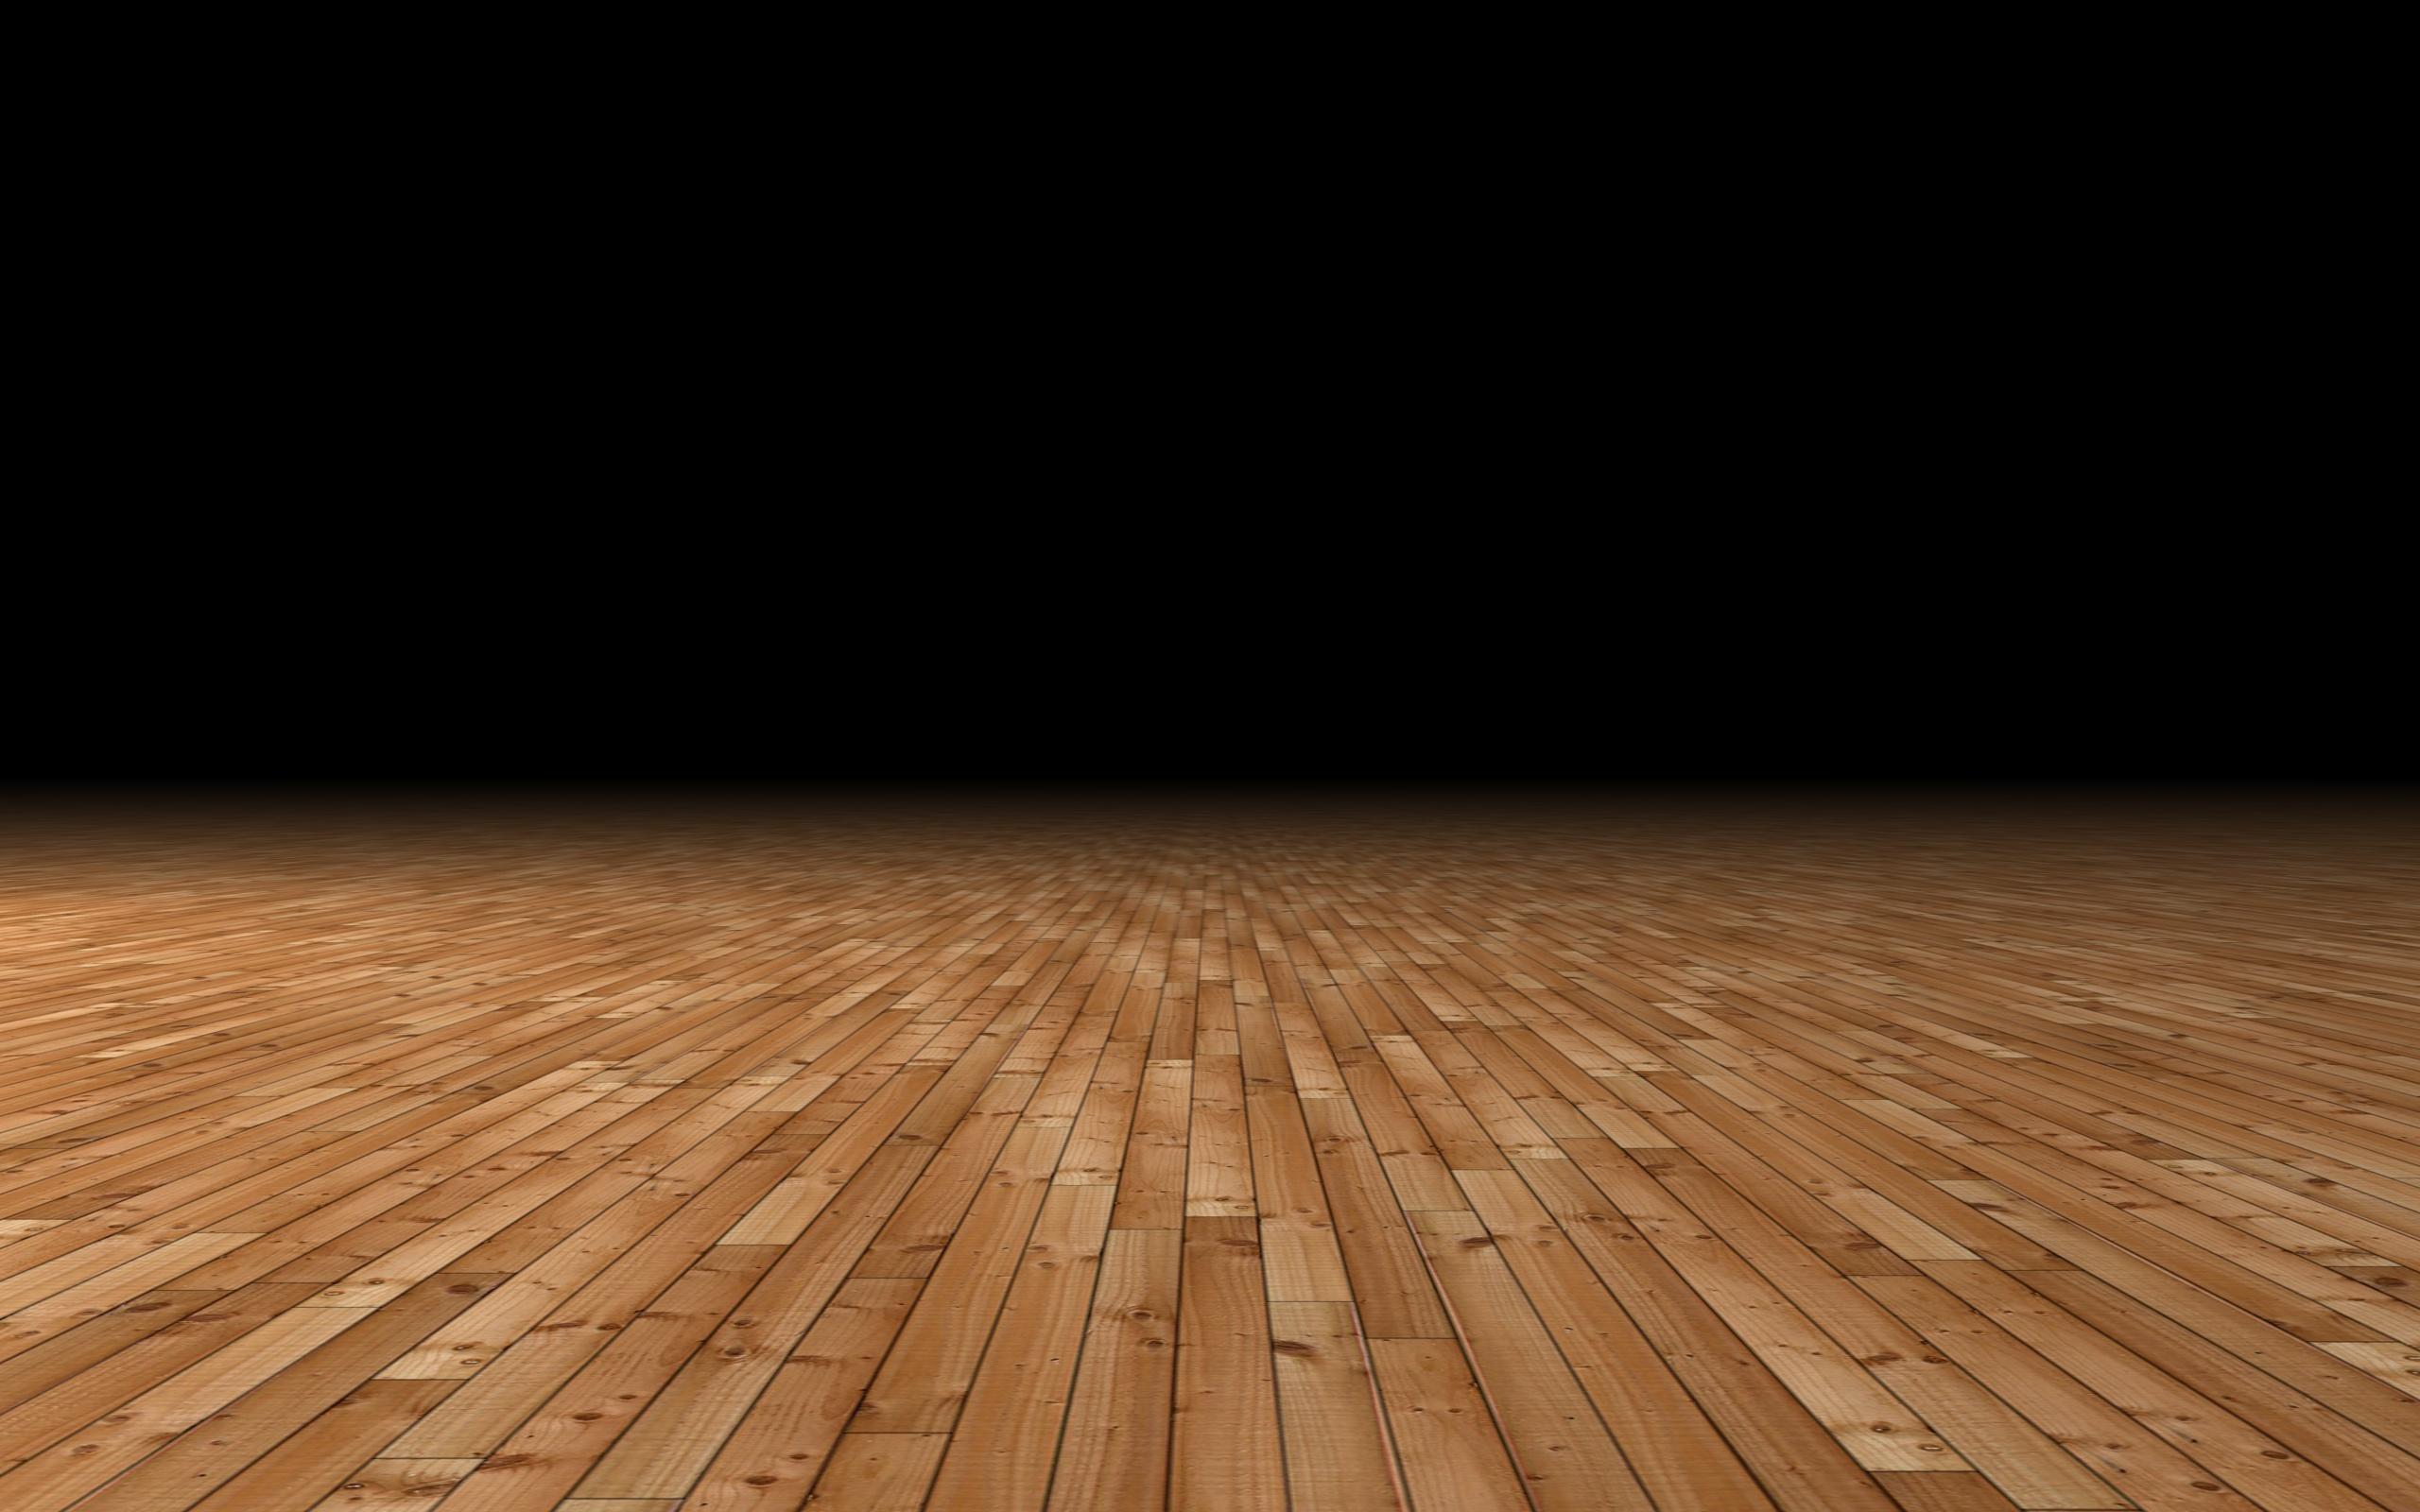 above stock viewed photo floors court image hardwood from basketball floor shutterstock maple